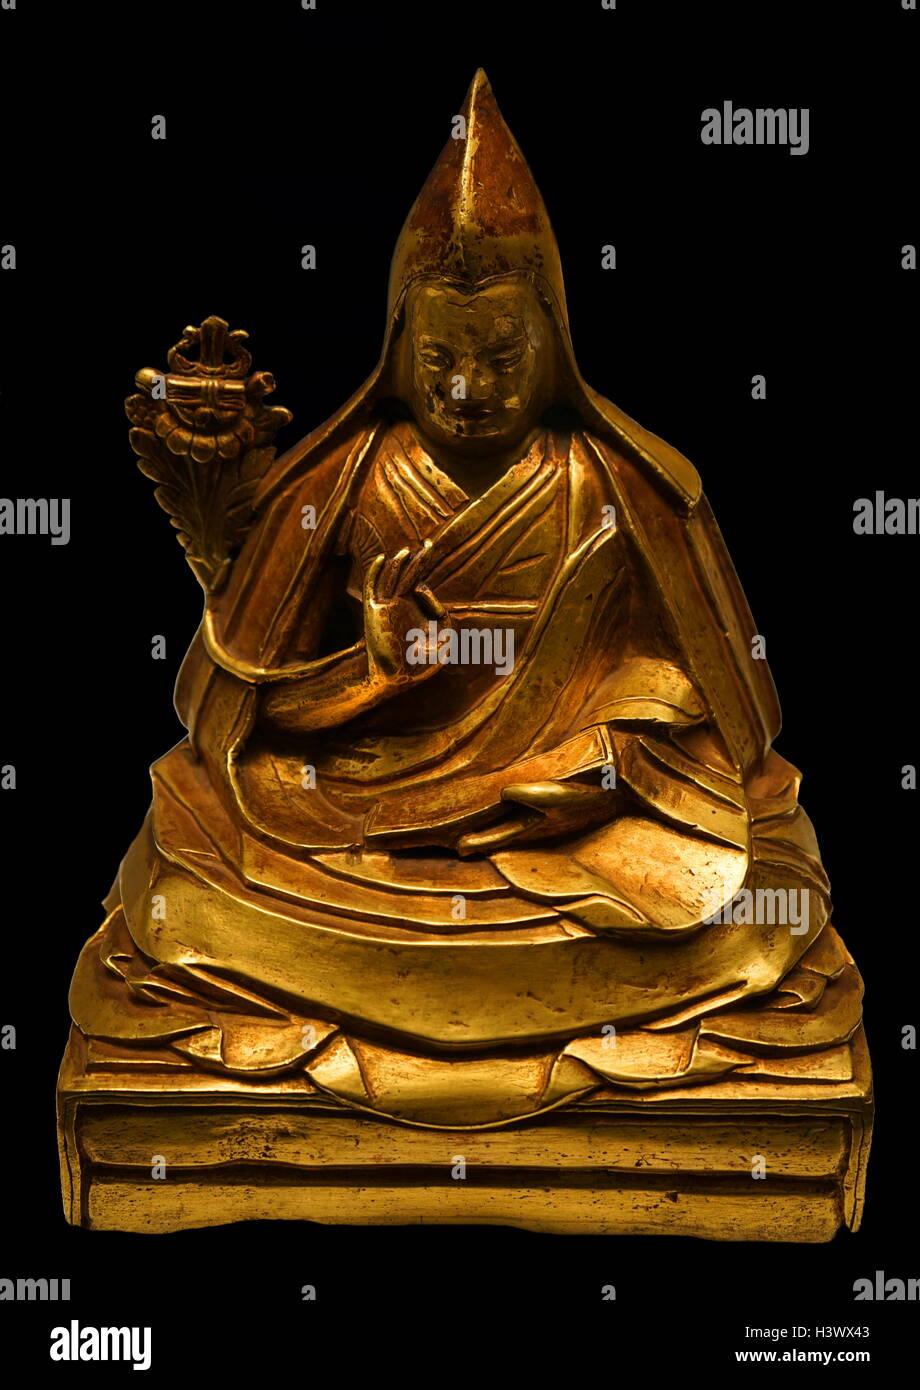 Kelzany Gyasto (1708-1757), 7th Dalai Lama from Tibet. Dated 19th Century - Stock Image